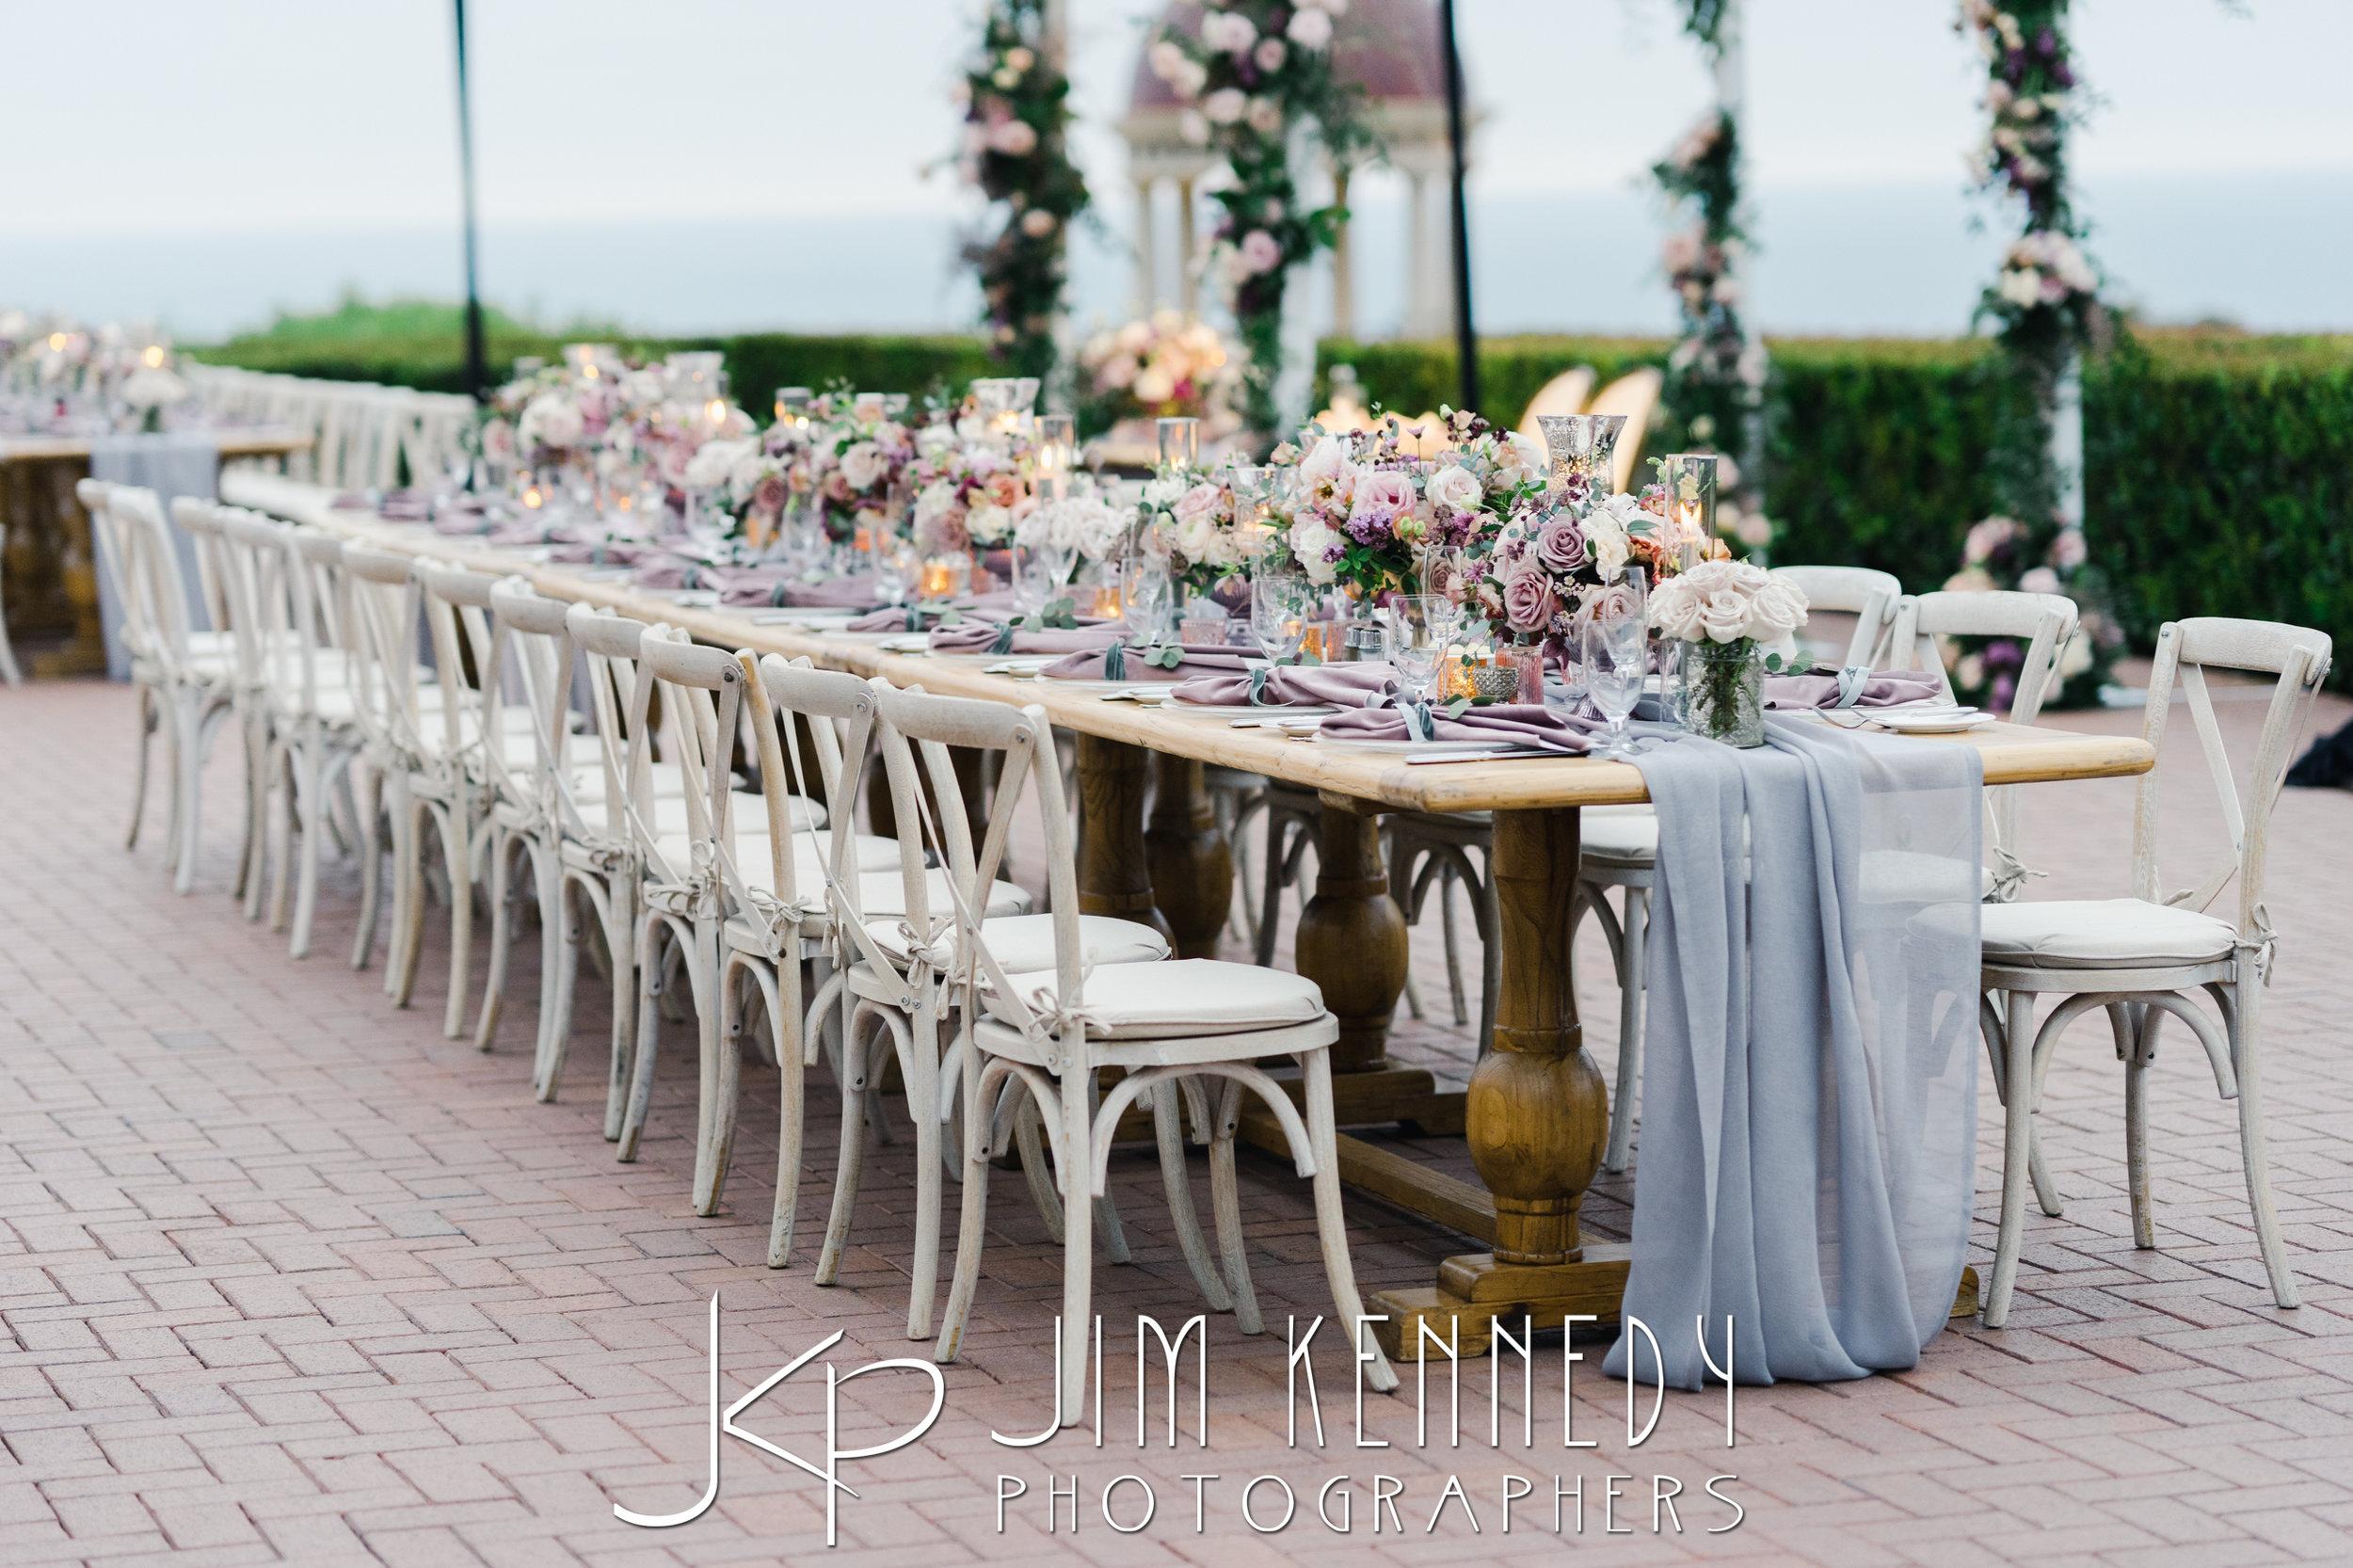 pelican-hill-wedding-jim-kenedy-photographers_0207.JPG